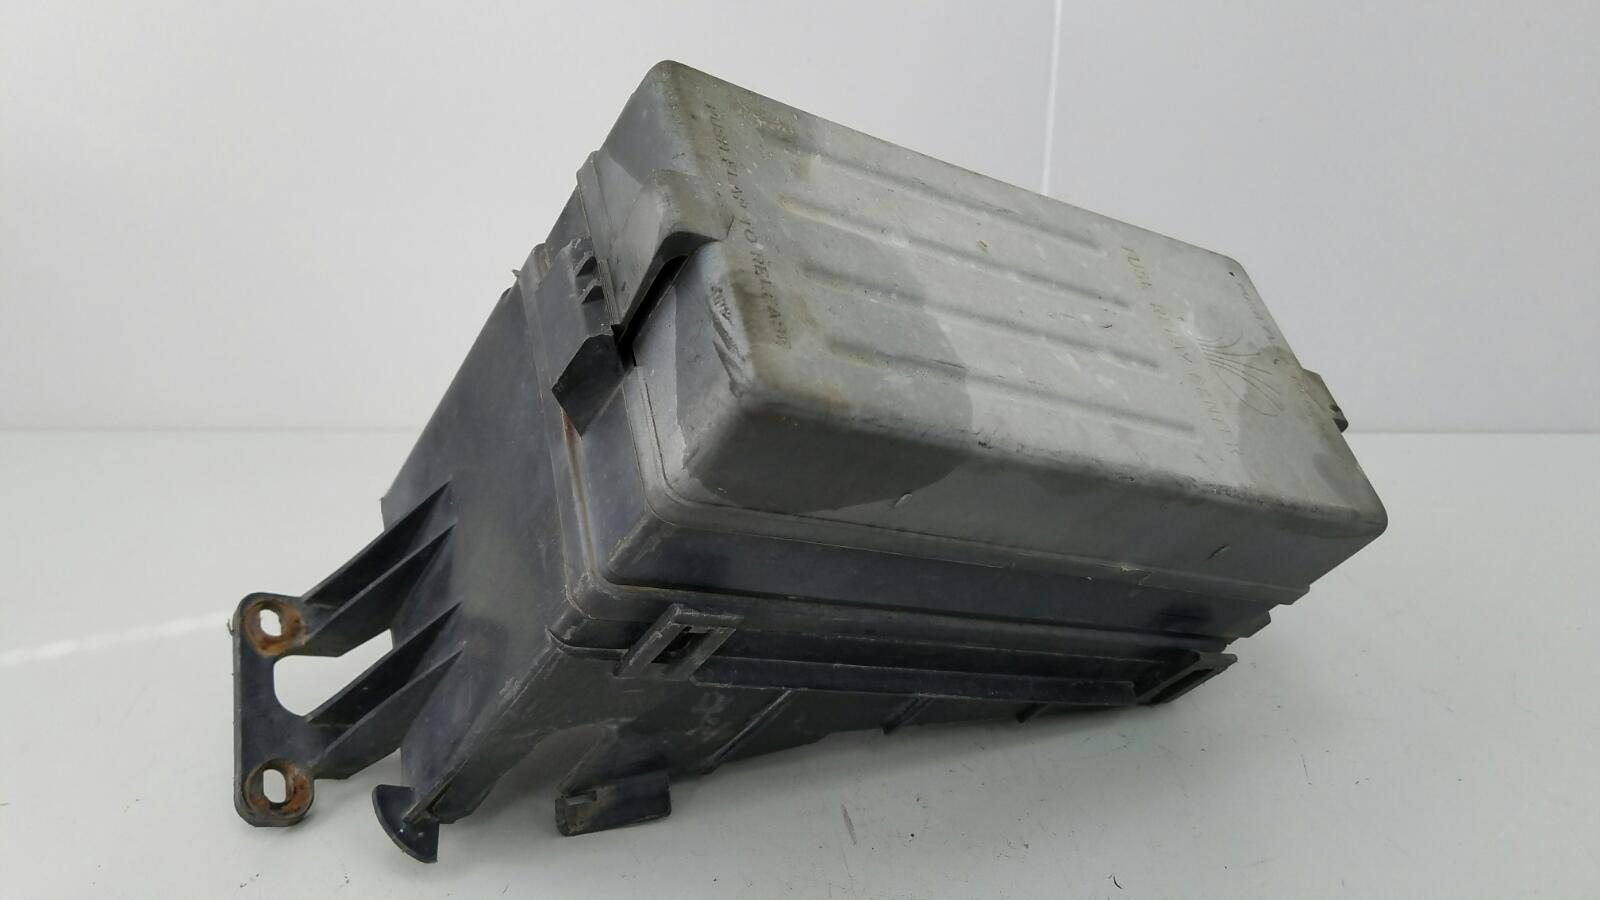 Блок предохранителей Daewoo Leganza C20SED 2.0Л 1998